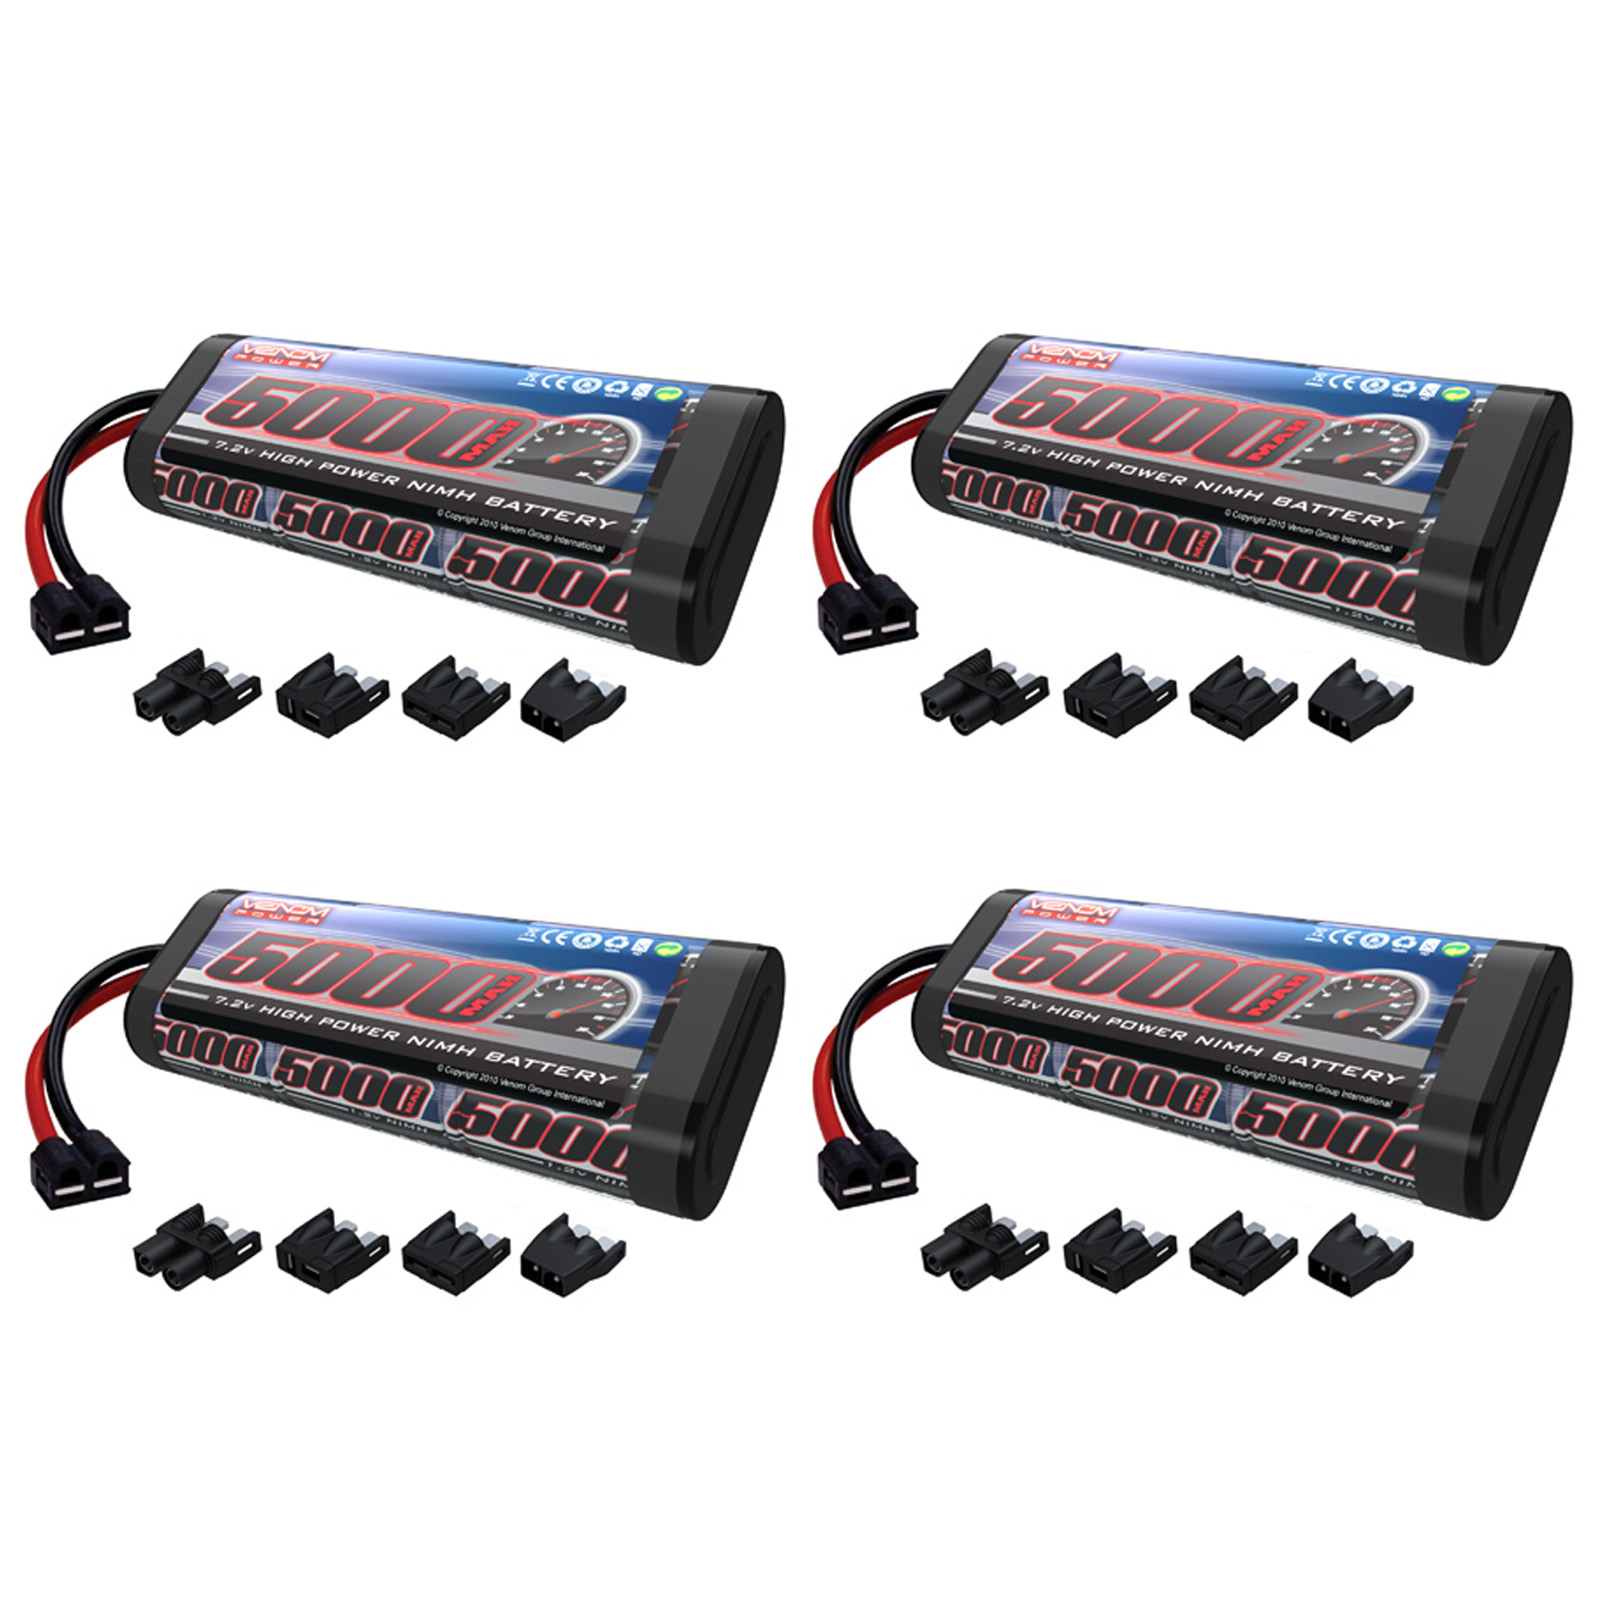 VENOM 7.2V 5000mAh 6-Cell NiMH Battery with Universal Plu...